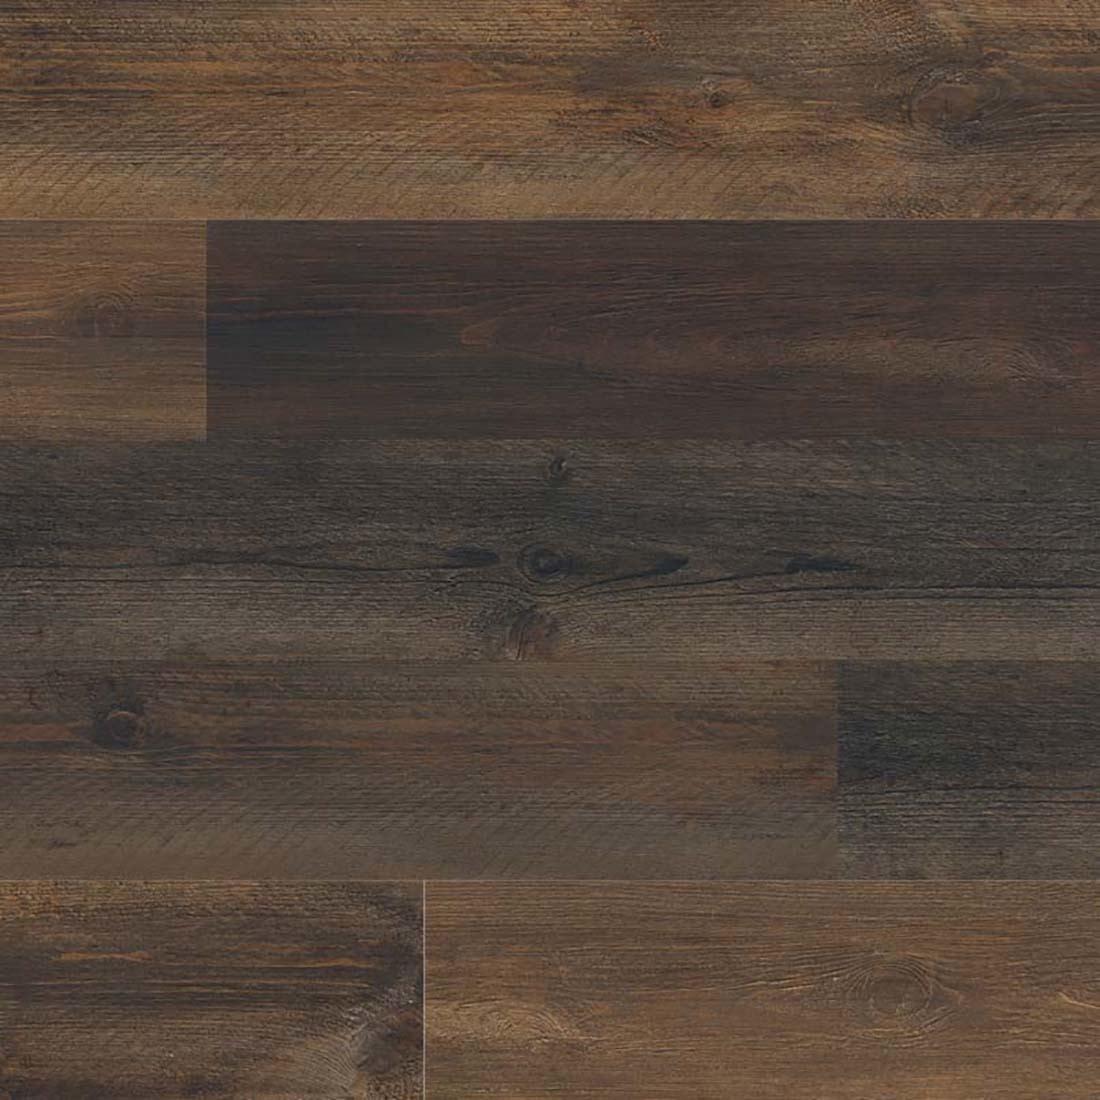 Seasoned Cherry / 5mm / SPC / Click Lock Vinyl Planks - 5mm SPC Click Lock - Lowcountry Collection 0